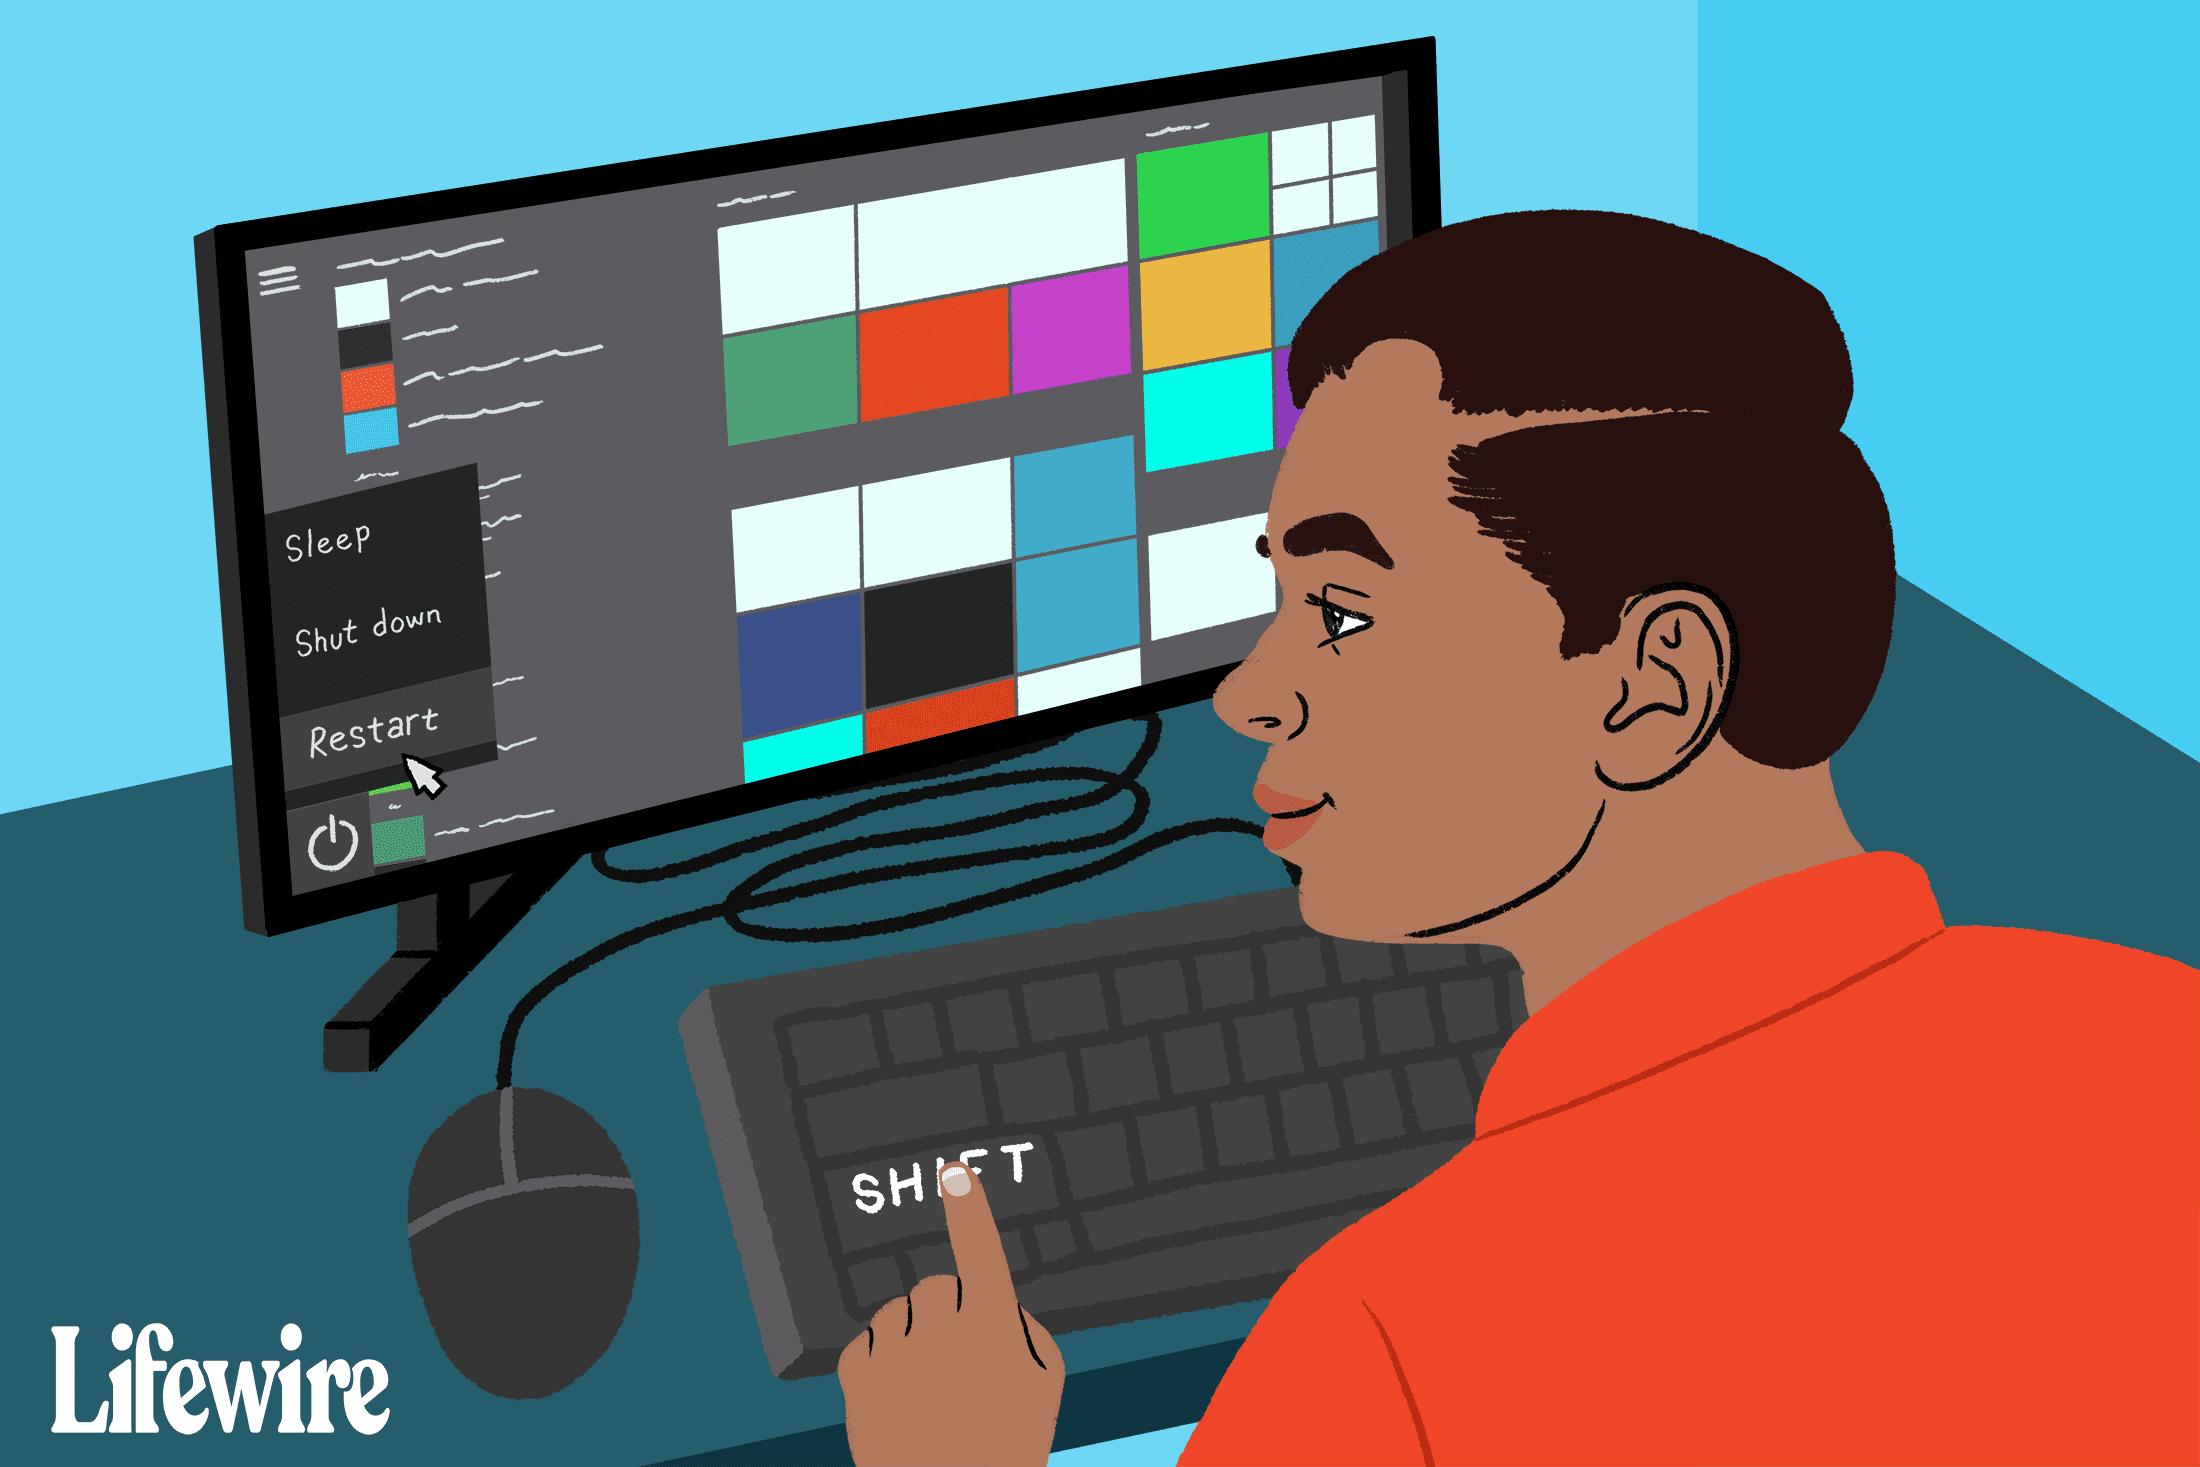 Person Shift-clicking Restore in Windows Start menu